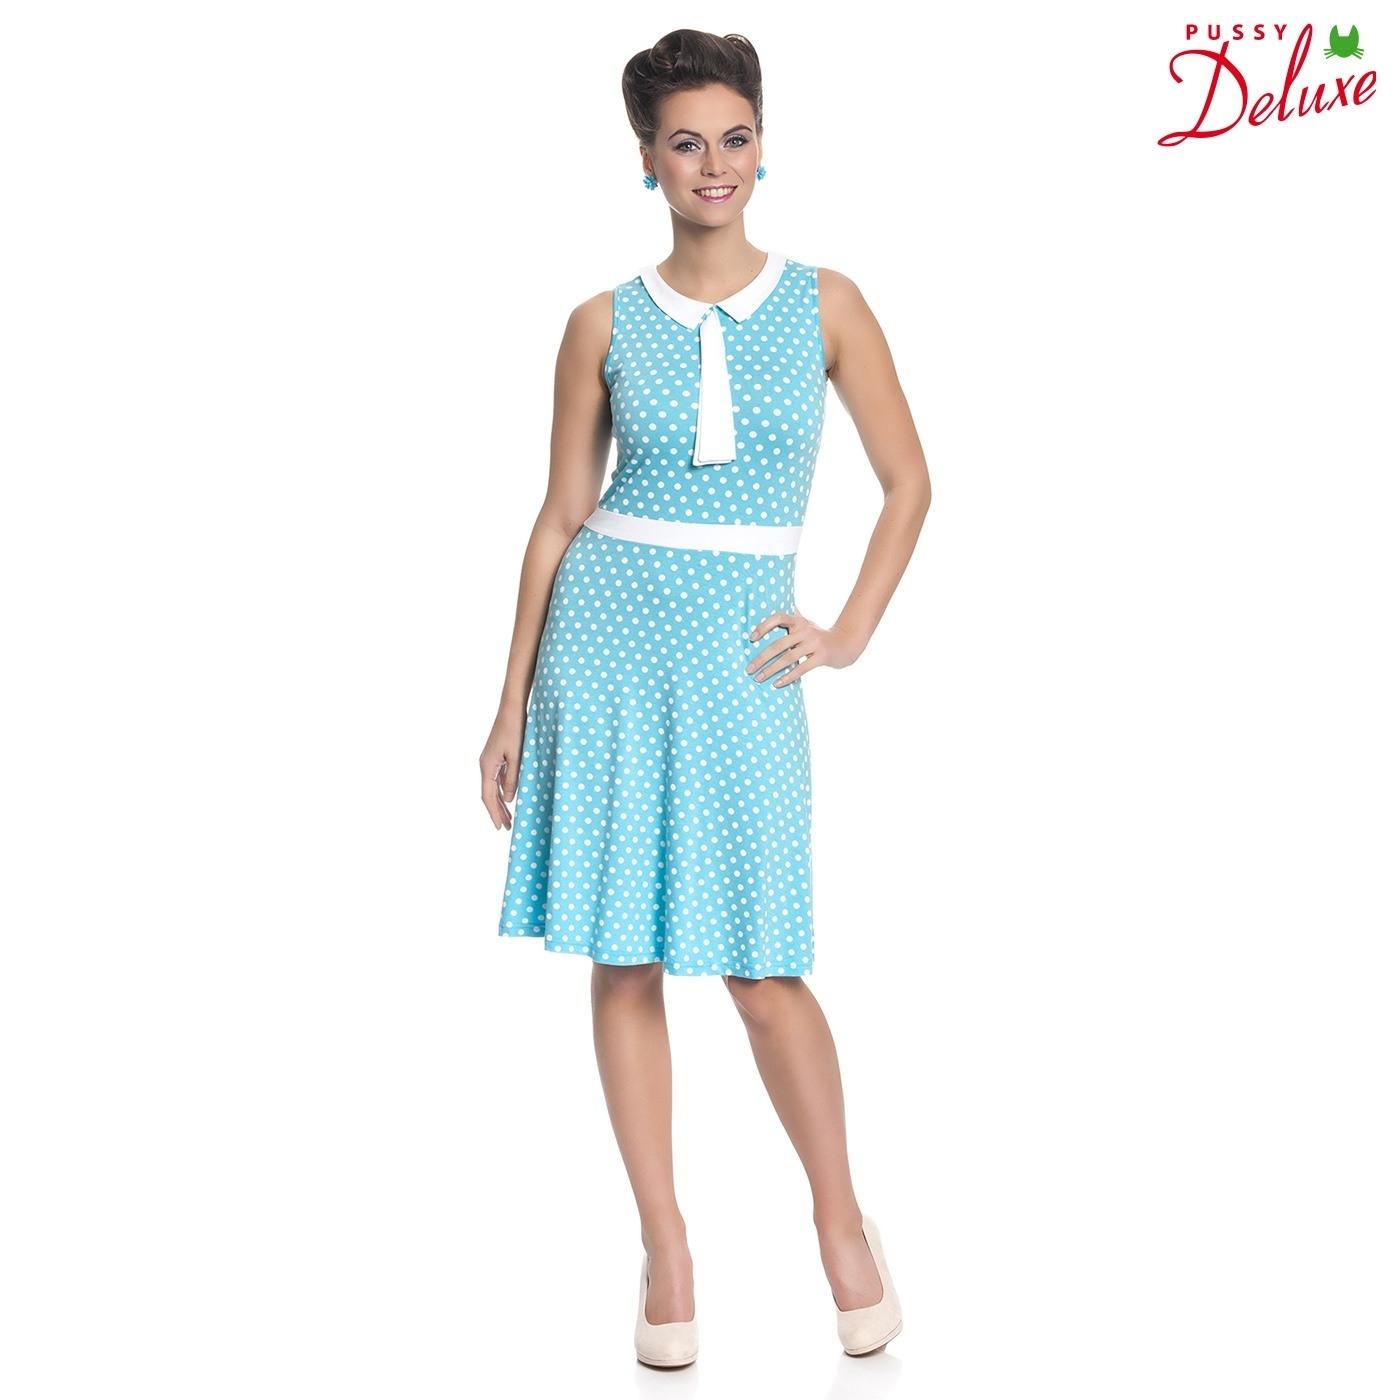 13 Elegant Kleid Hellblau GalerieFormal Einzigartig Kleid Hellblau Design